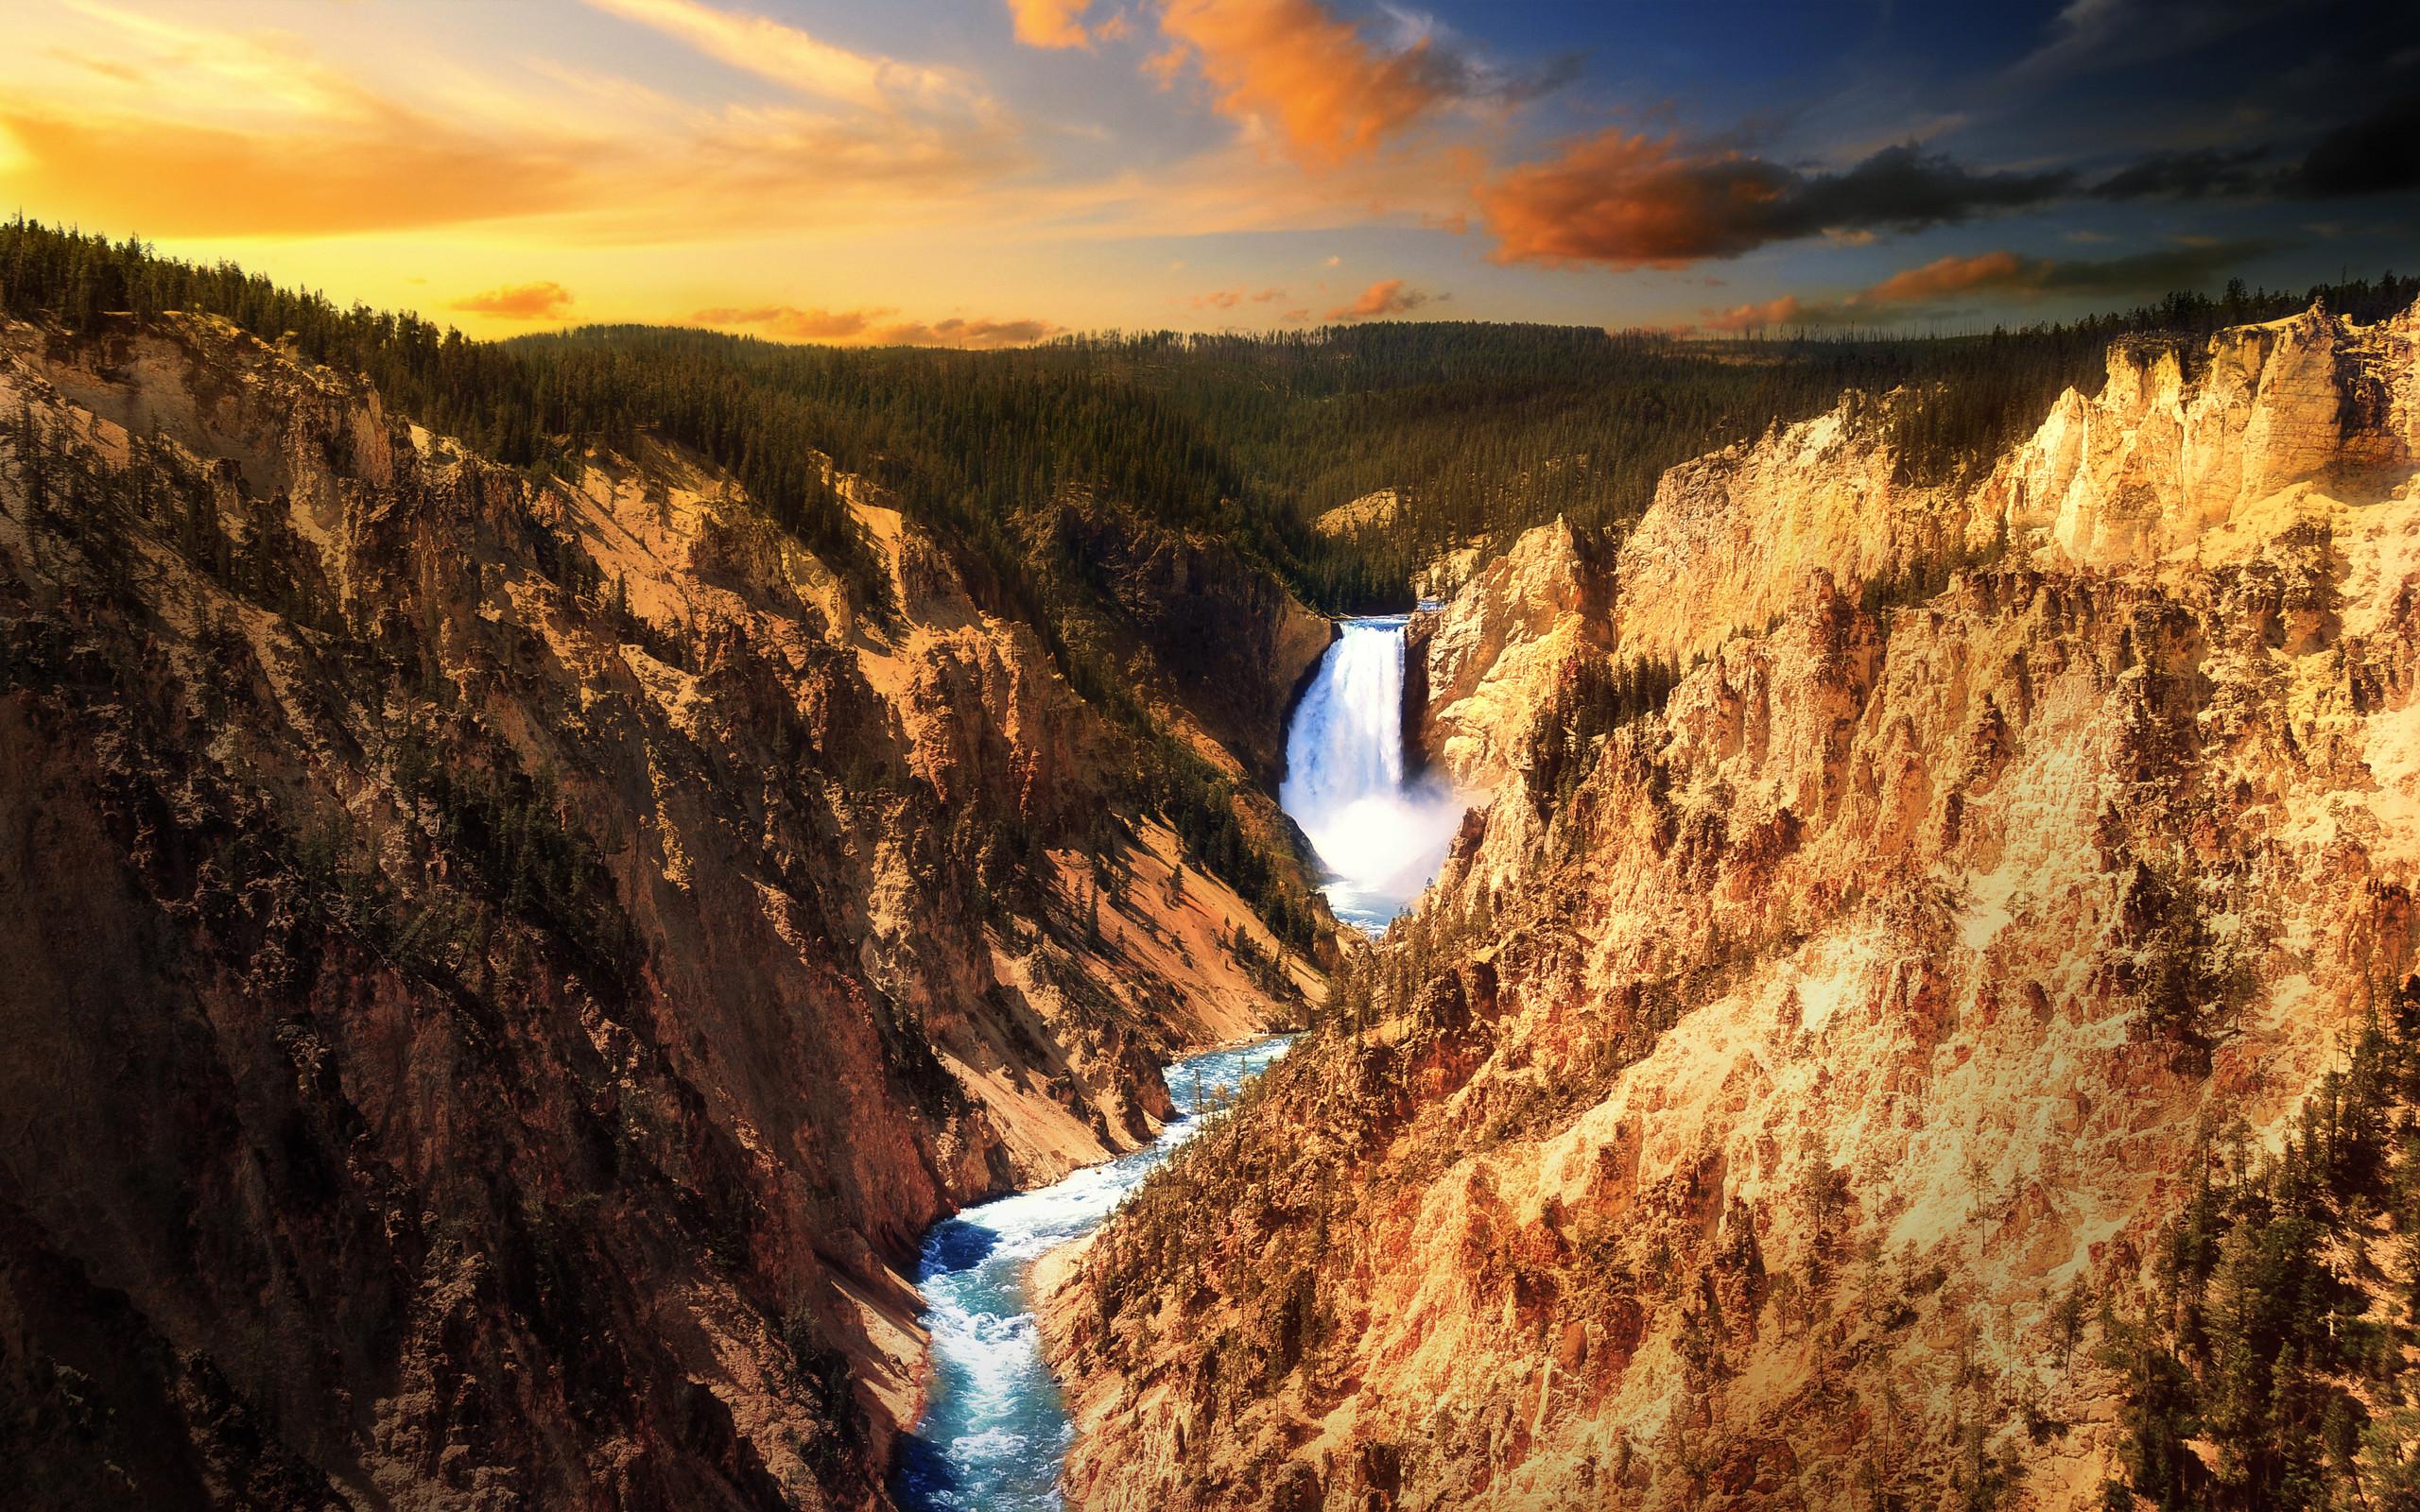 Yellowstone Wallpaper Desktop 71 images 2560x1600